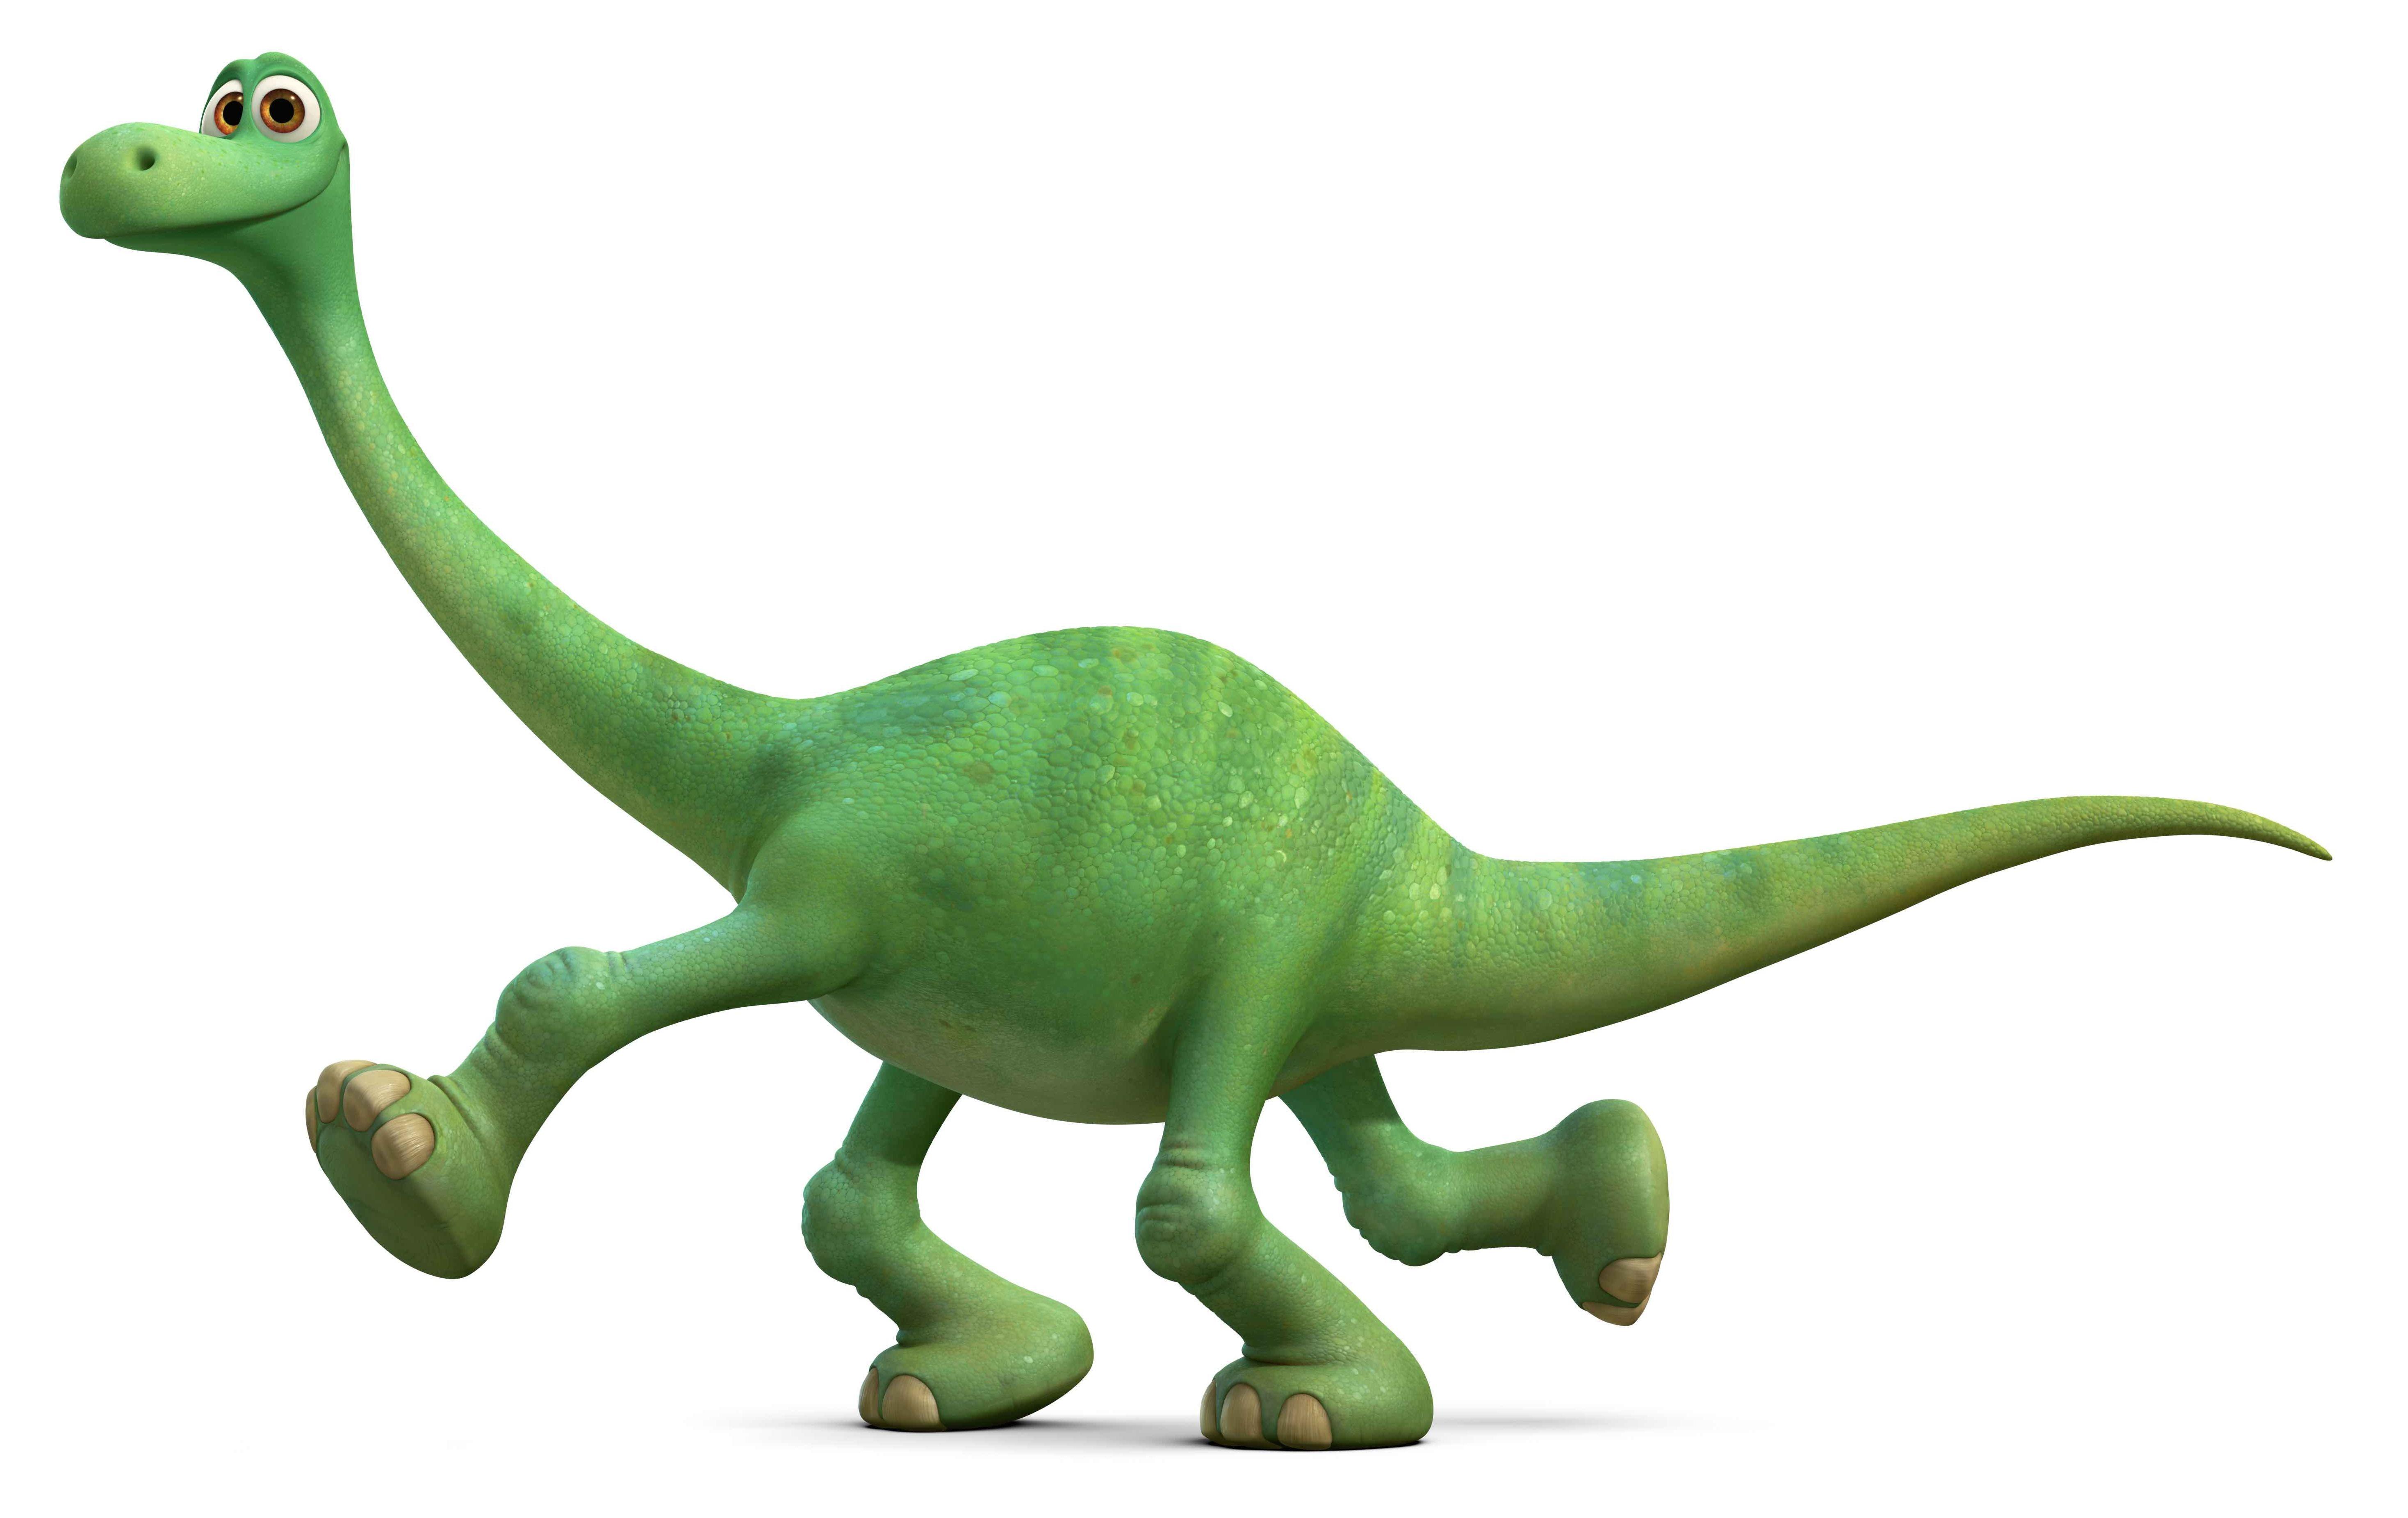 Arlo the Good Dinosaur | Un buen dinosaurio | Pinterest | Disney images